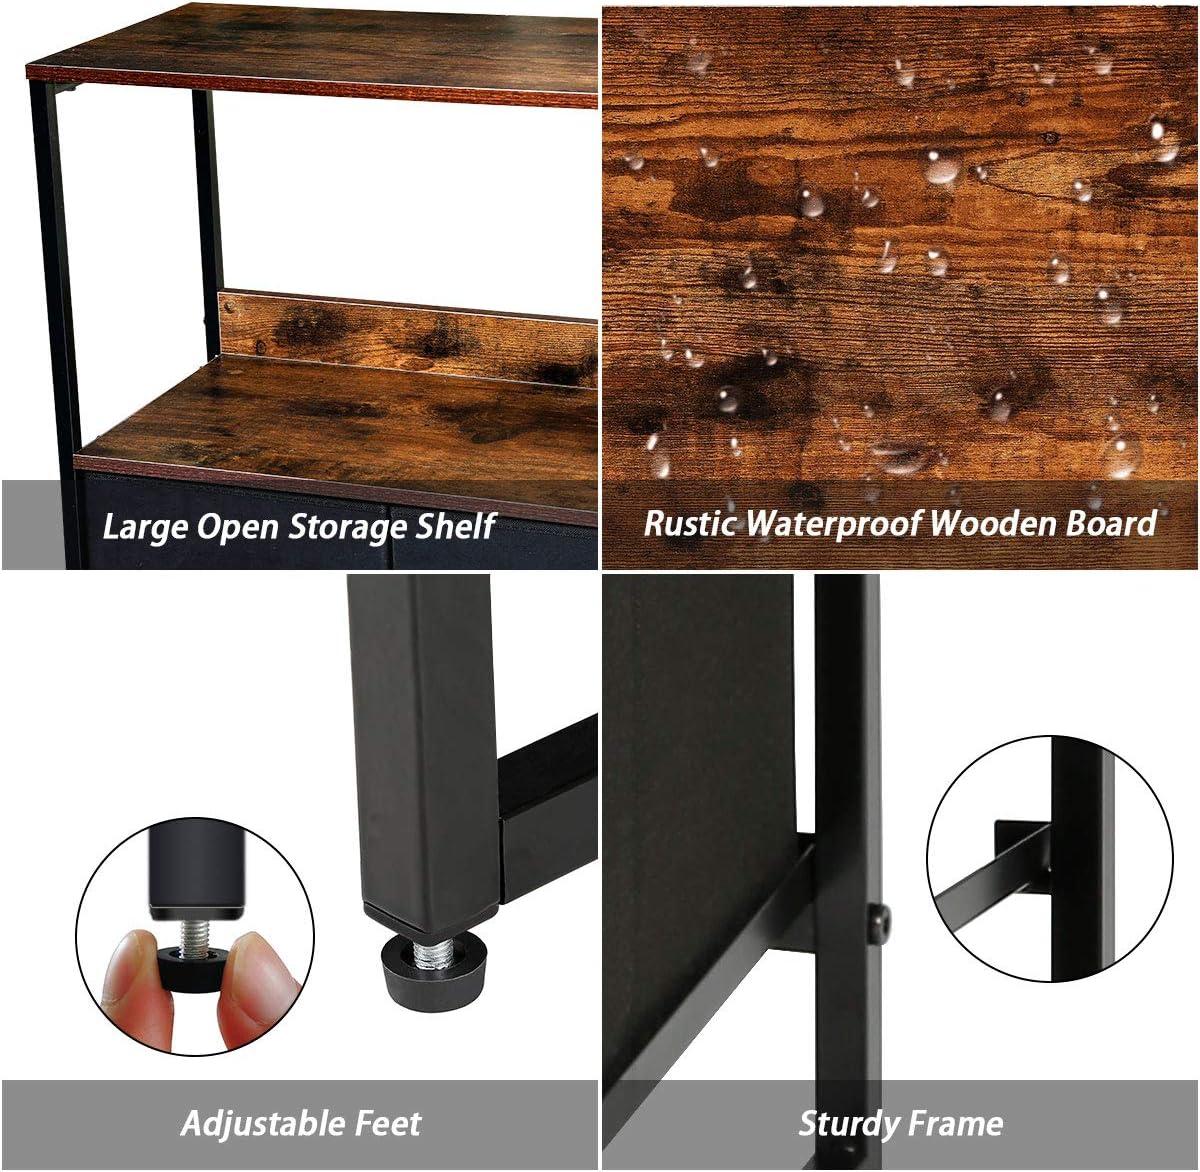 Wood Top Living Room Hallway Sturdy Steel Frame Dresser Organizer Furniture Tower for Bedroom Floor Cabinet with 2-Tier Shelves Kamiler Storage Cabinet with 3 Drawers